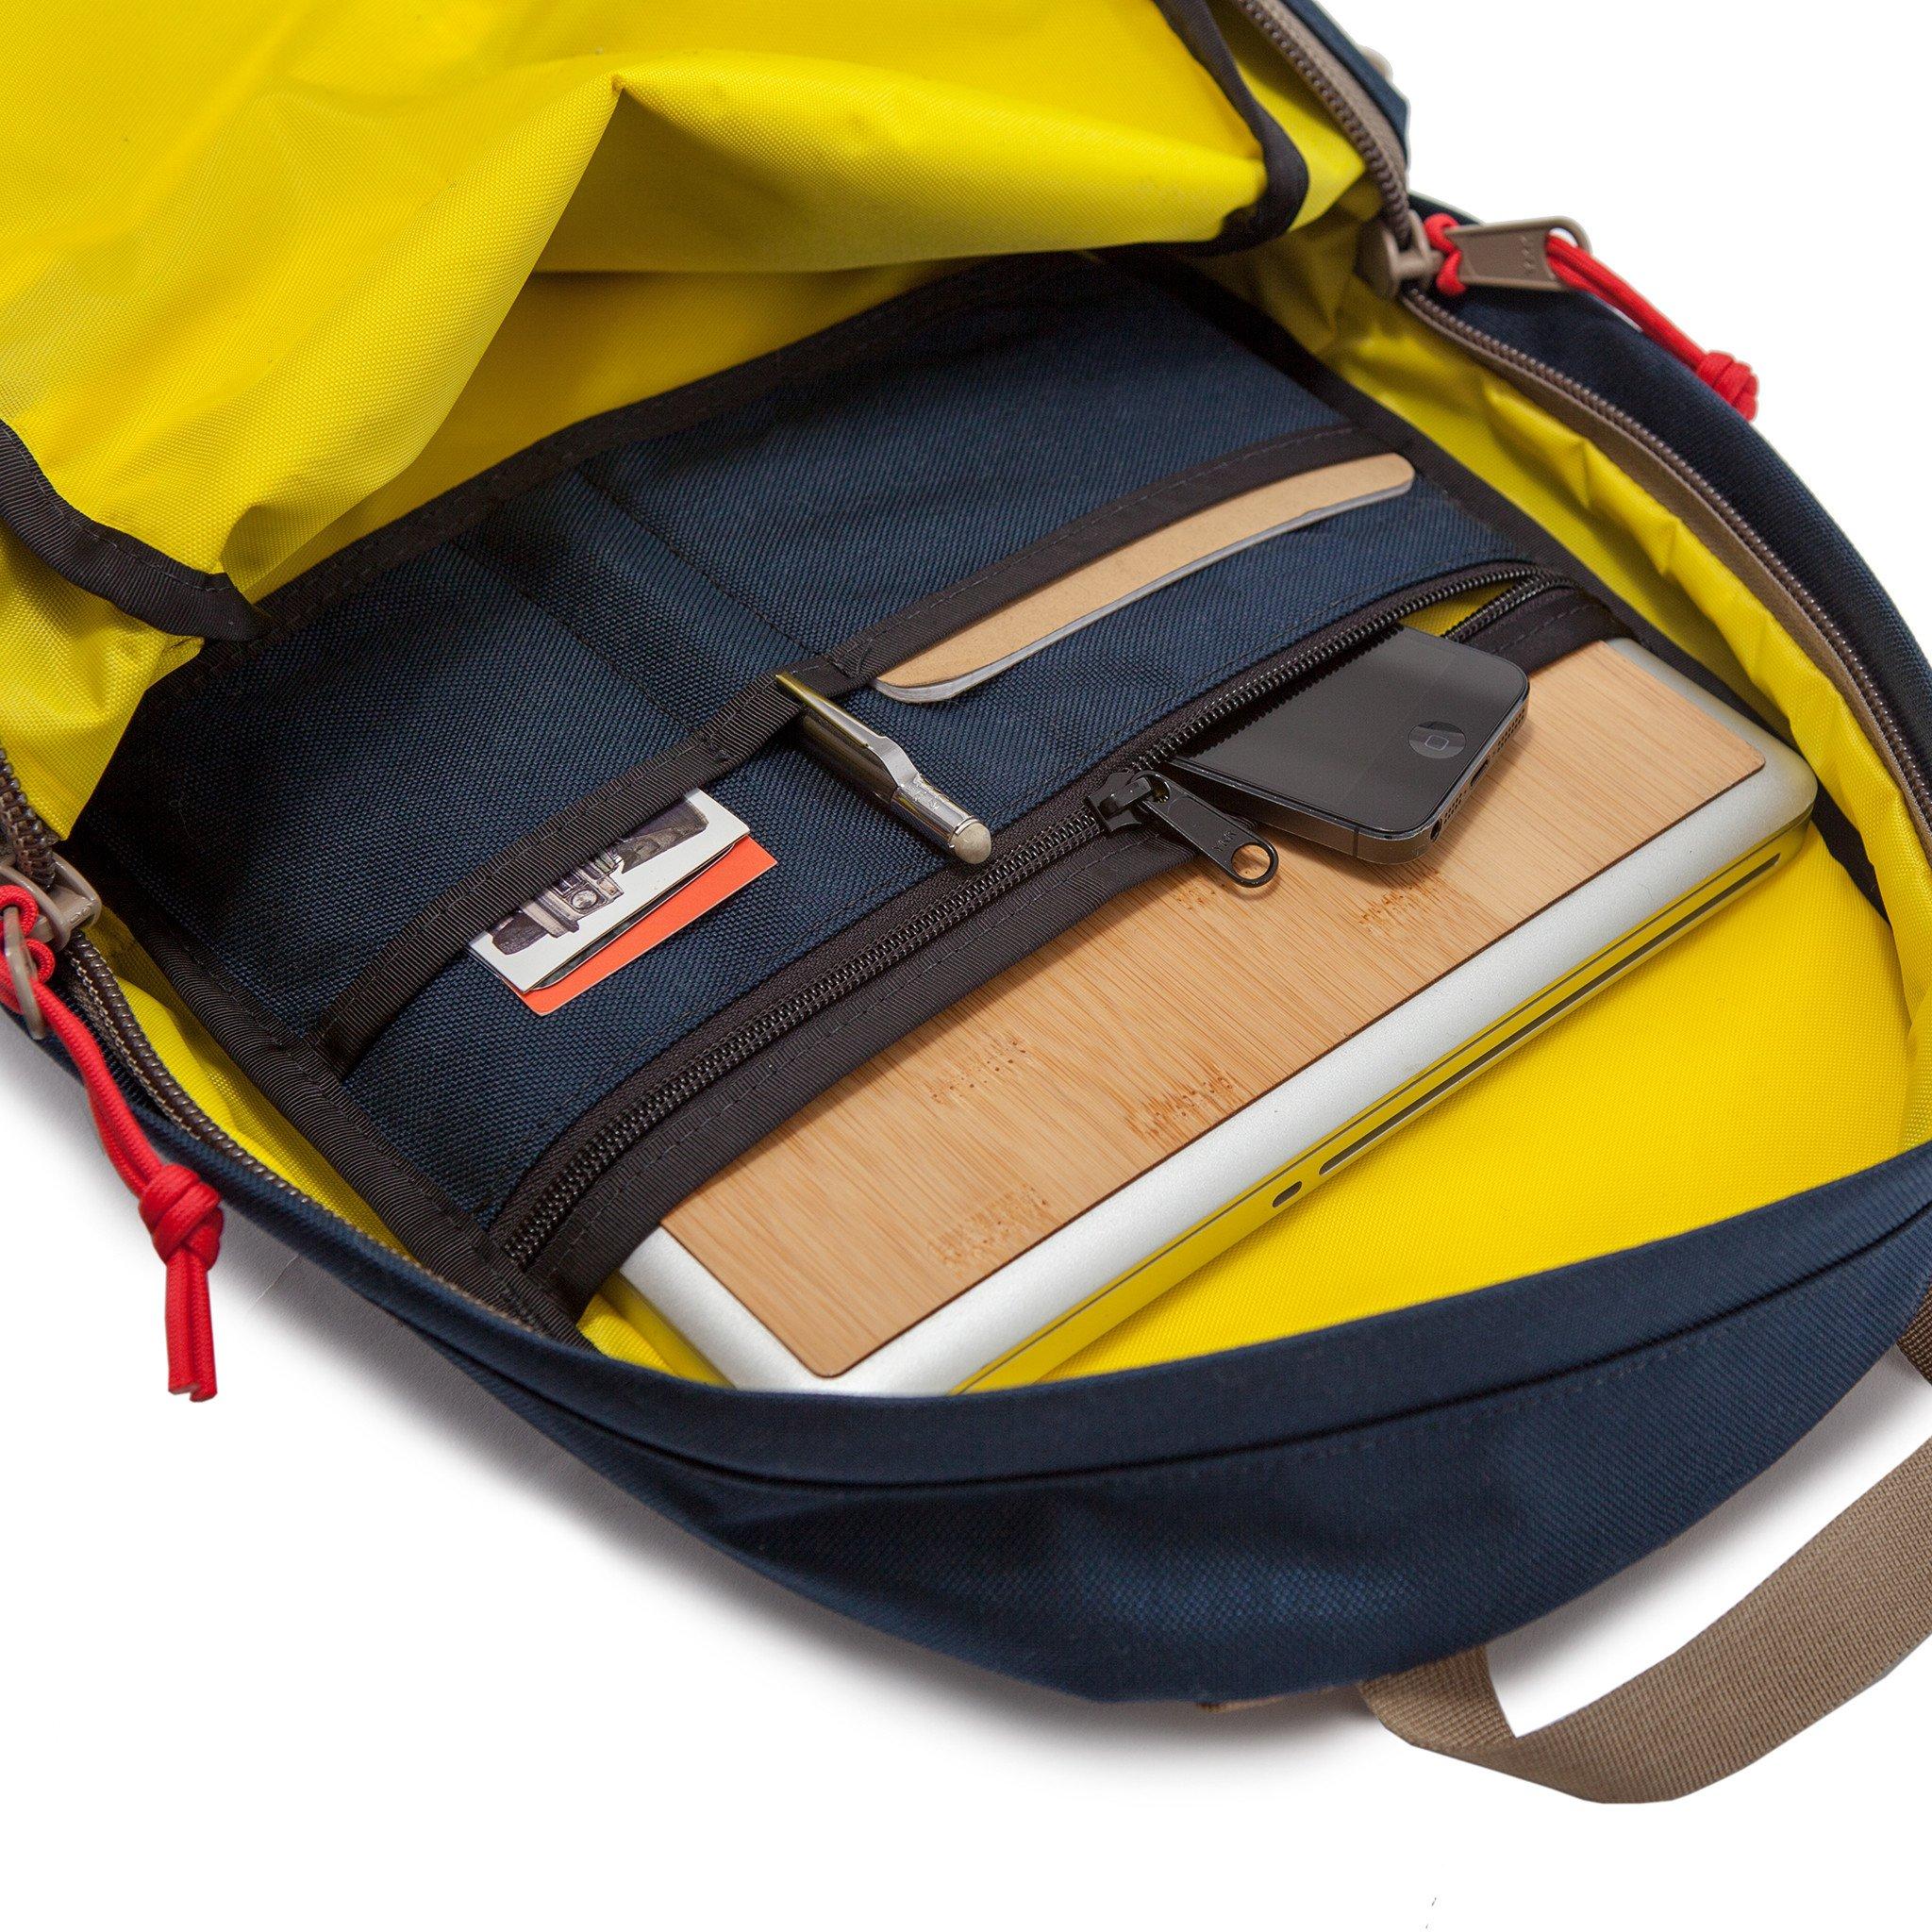 bags-daypack-interior_2048x2048.jpg